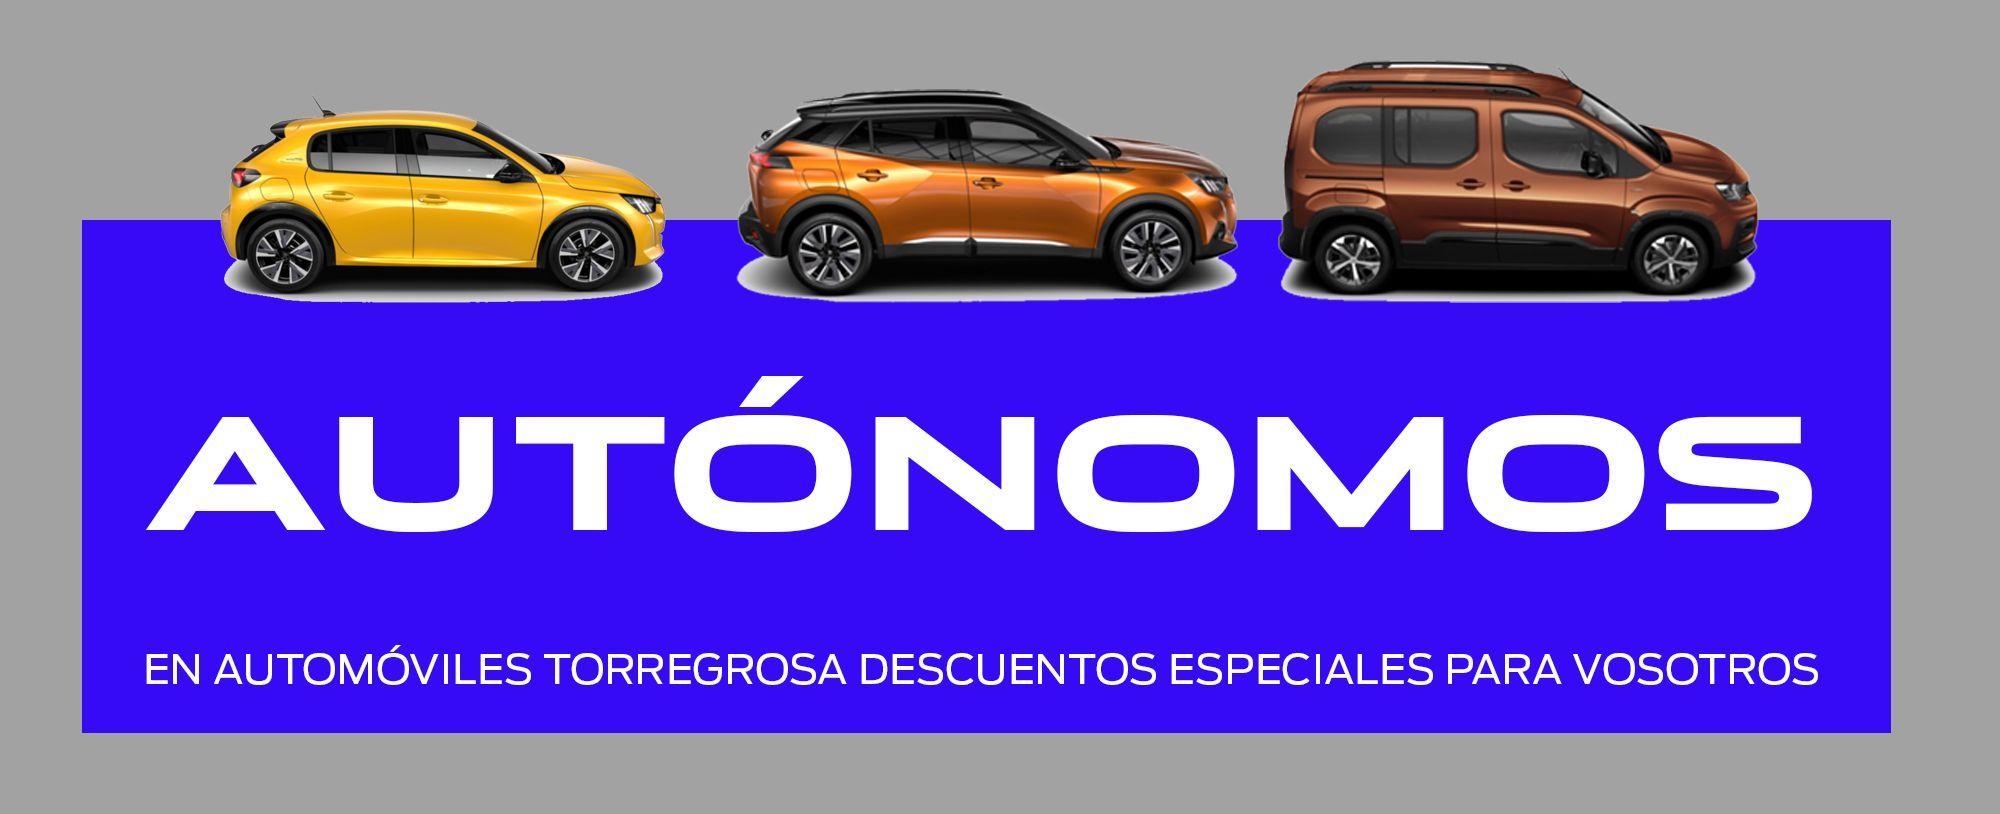 OFERTA ESPECIAL AUTÓNOMOS EN AUTOMÓVILES TORREGROSA